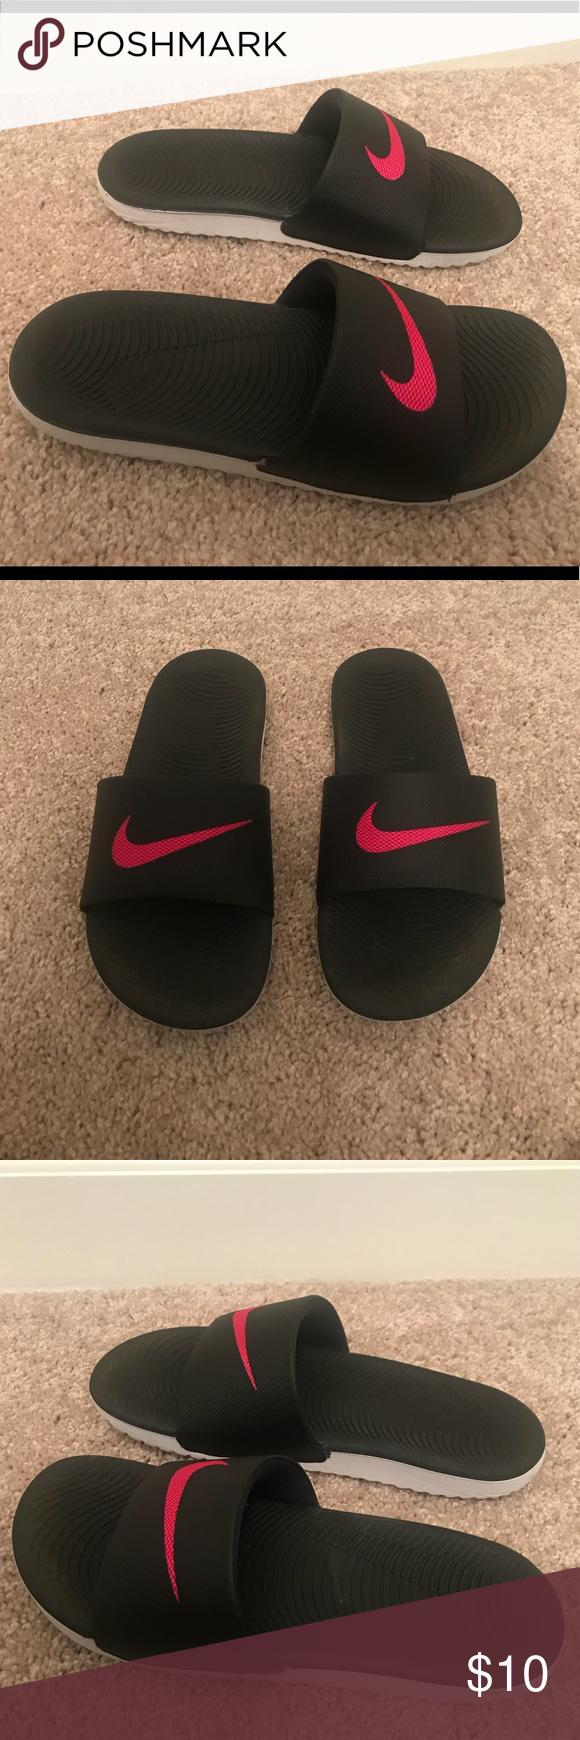 962ed020464929 Black   Pink Nike Women s Sandals Slides—Size 6 Black   Pink with white